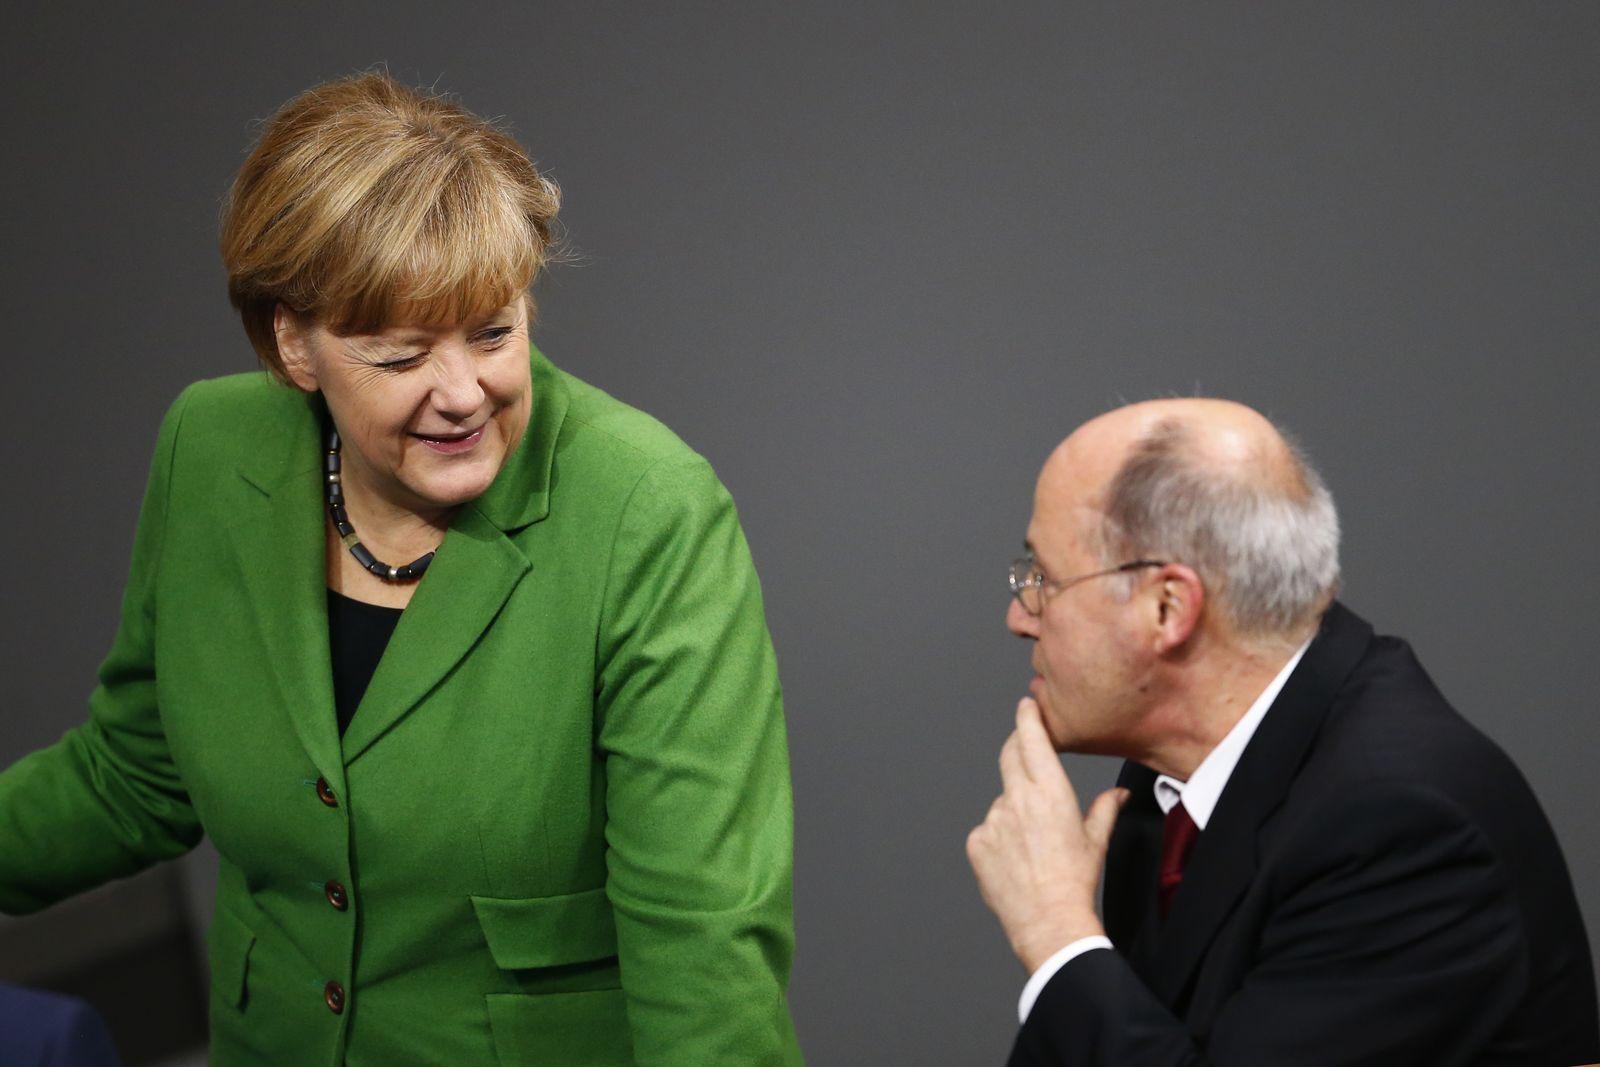 Angela Merkel / Gregor Gysi